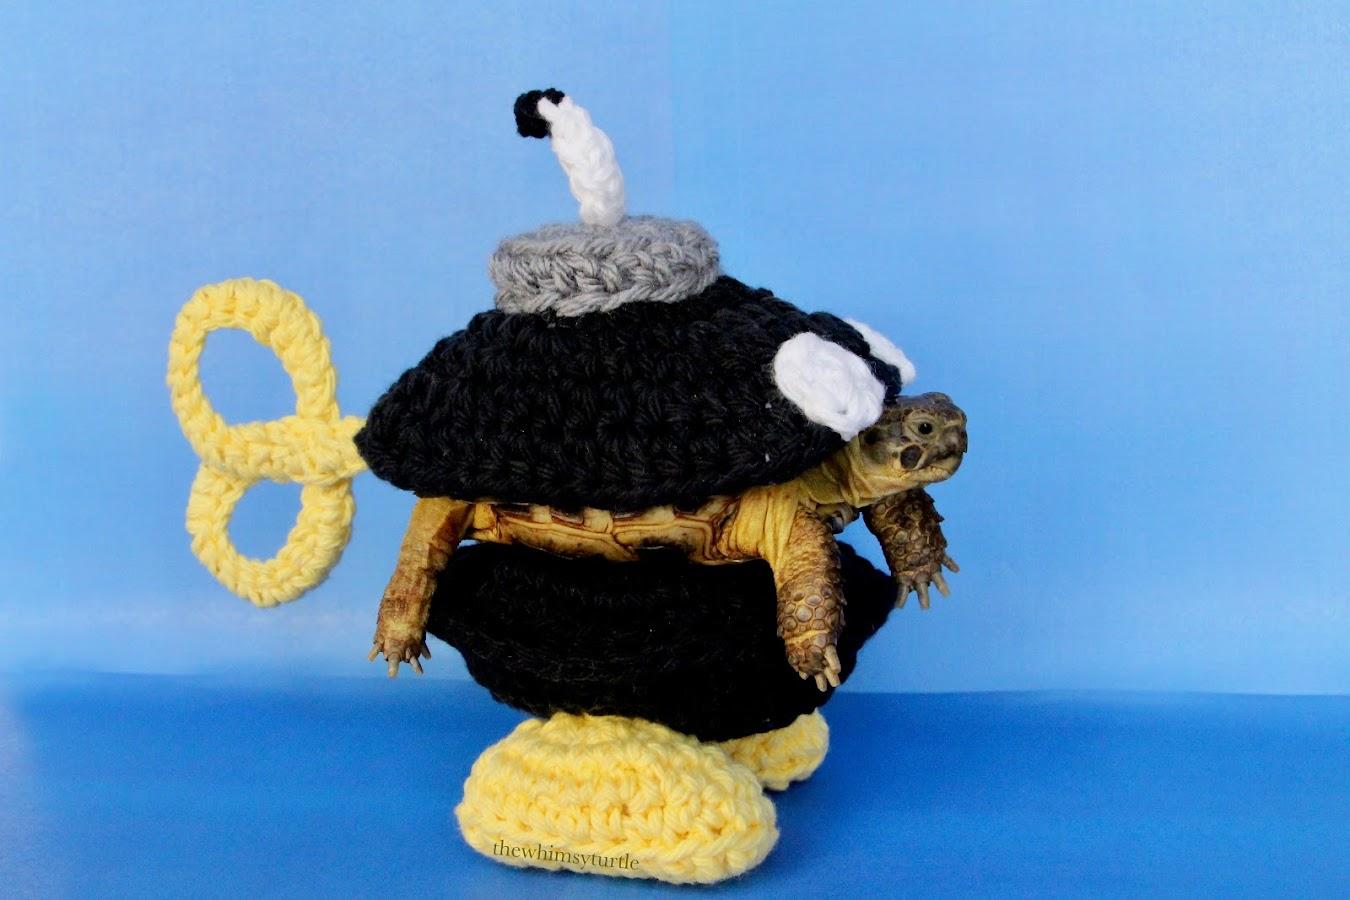 Tortoise Bob-omb costume